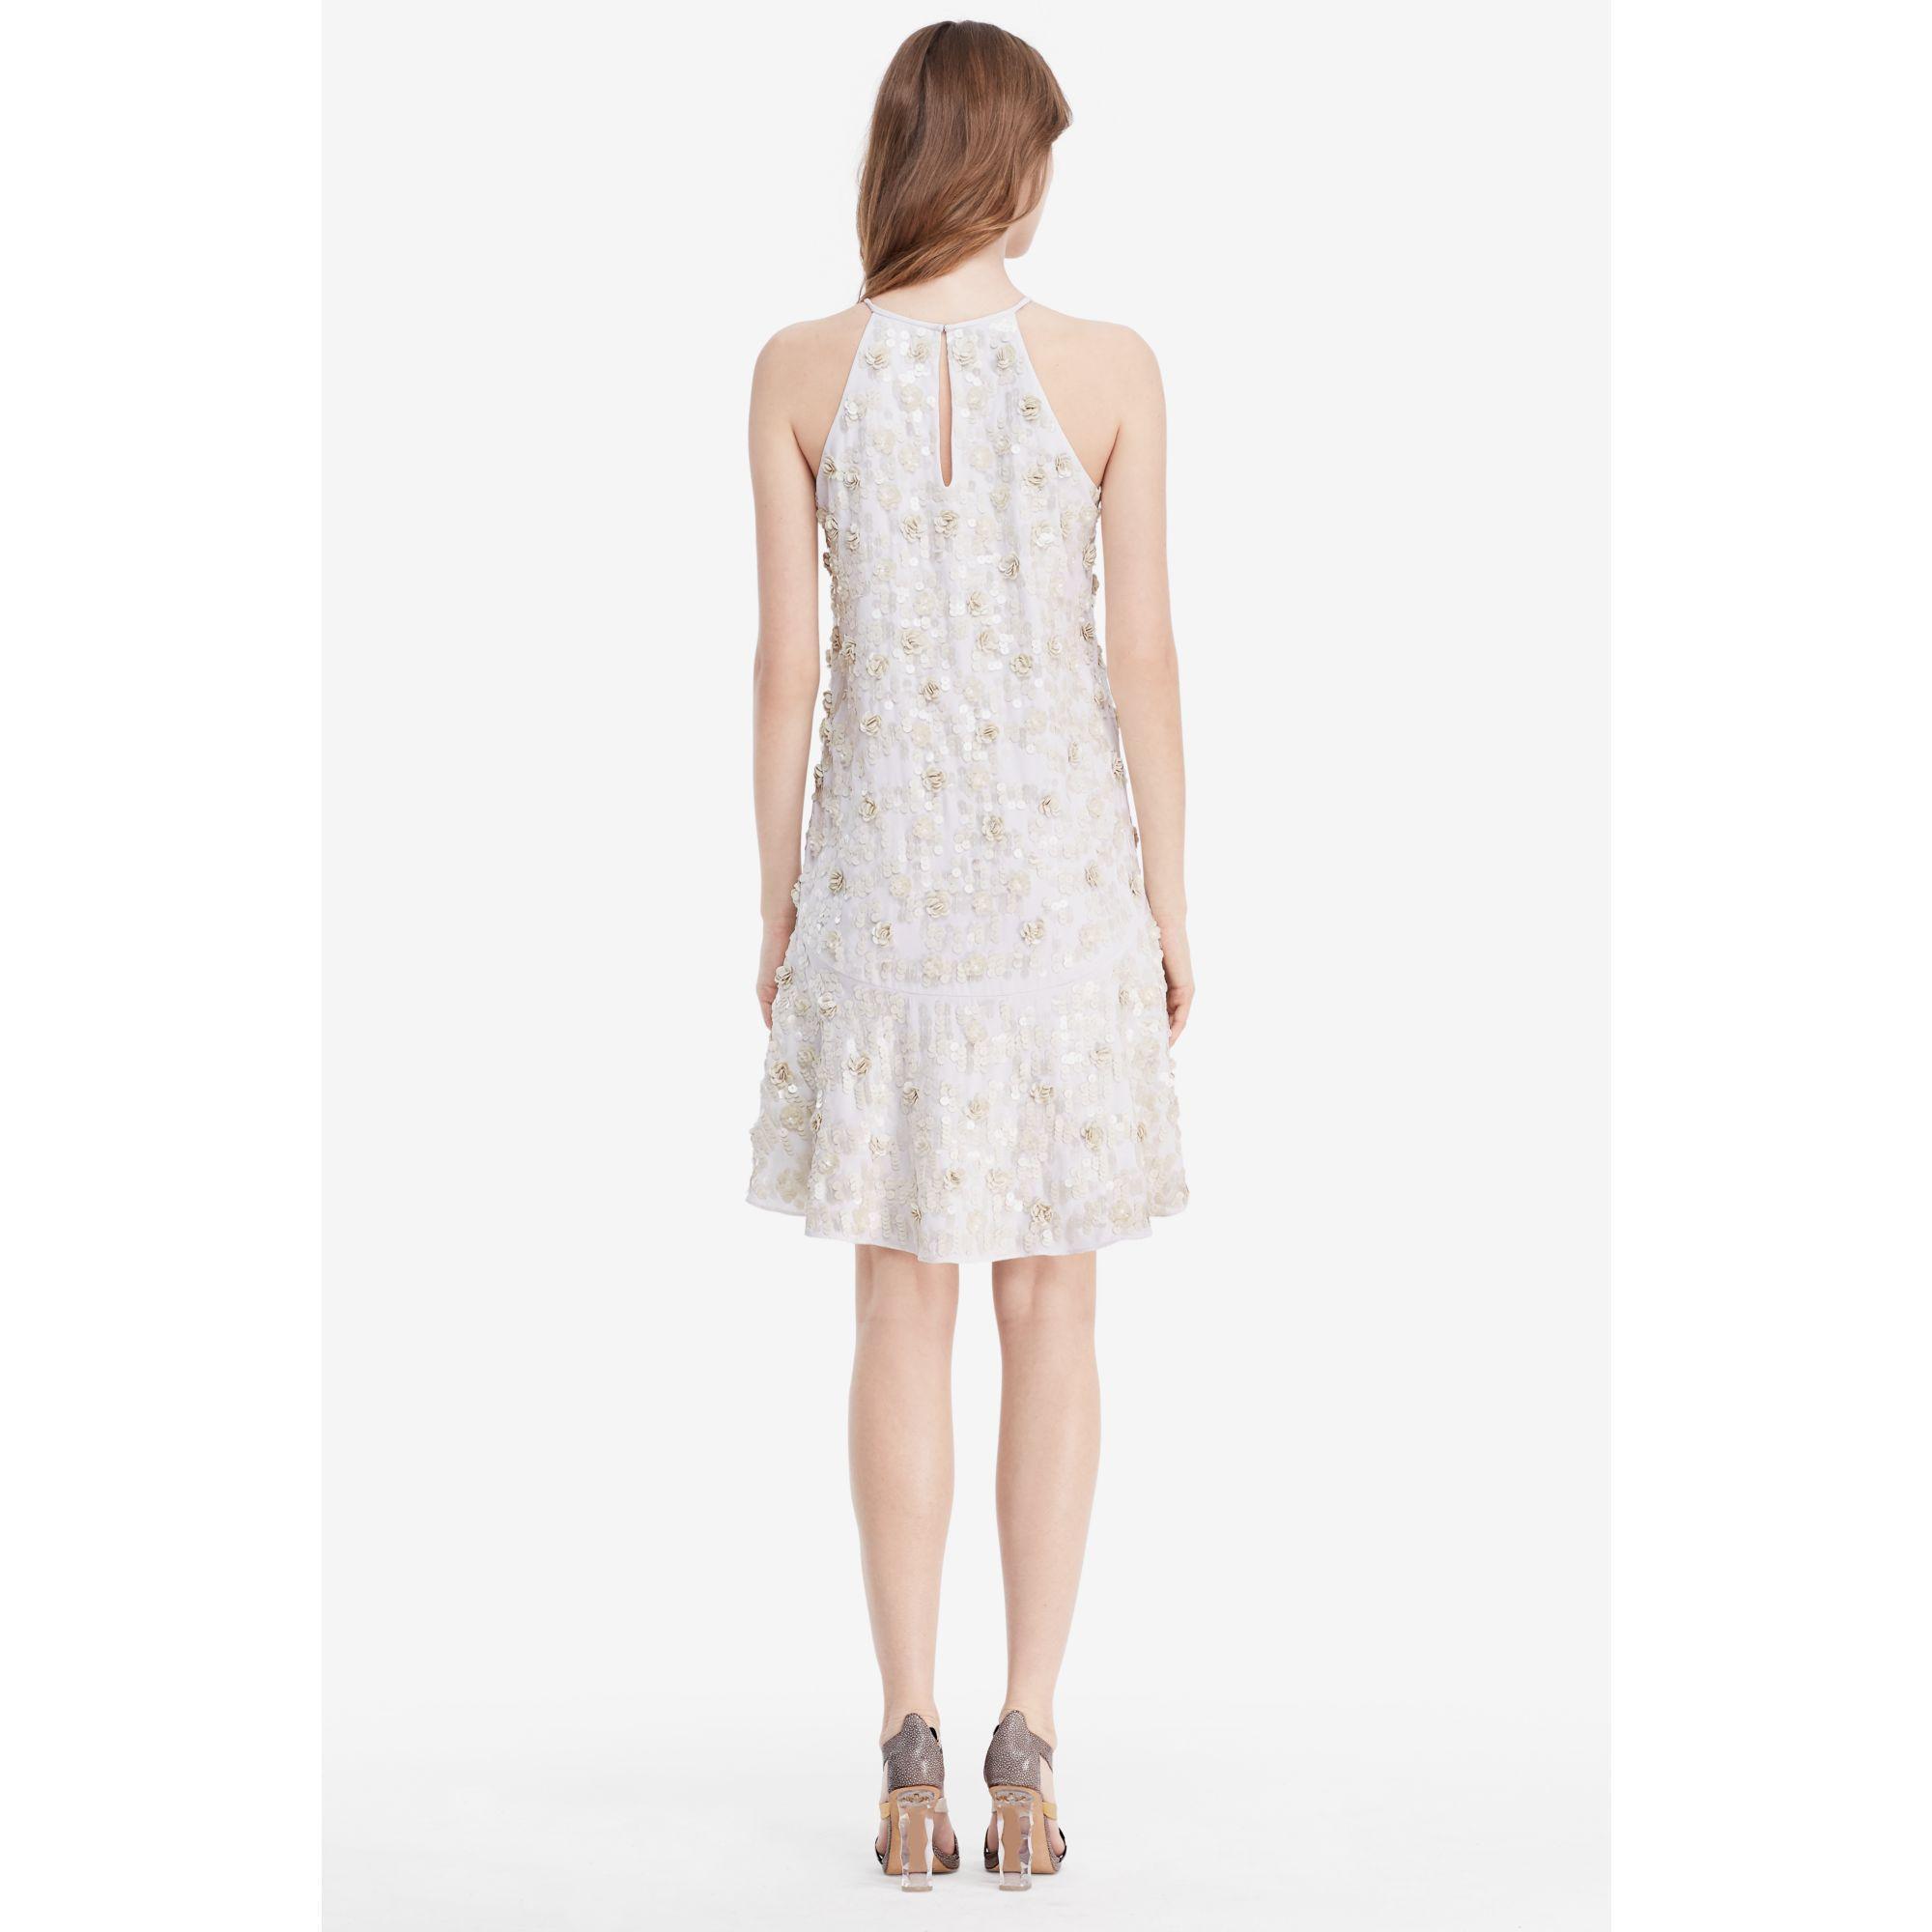 fc2581eb1ce Diane von Furstenberg Dvf Kera Sequin Embellished Dress in Natural ...